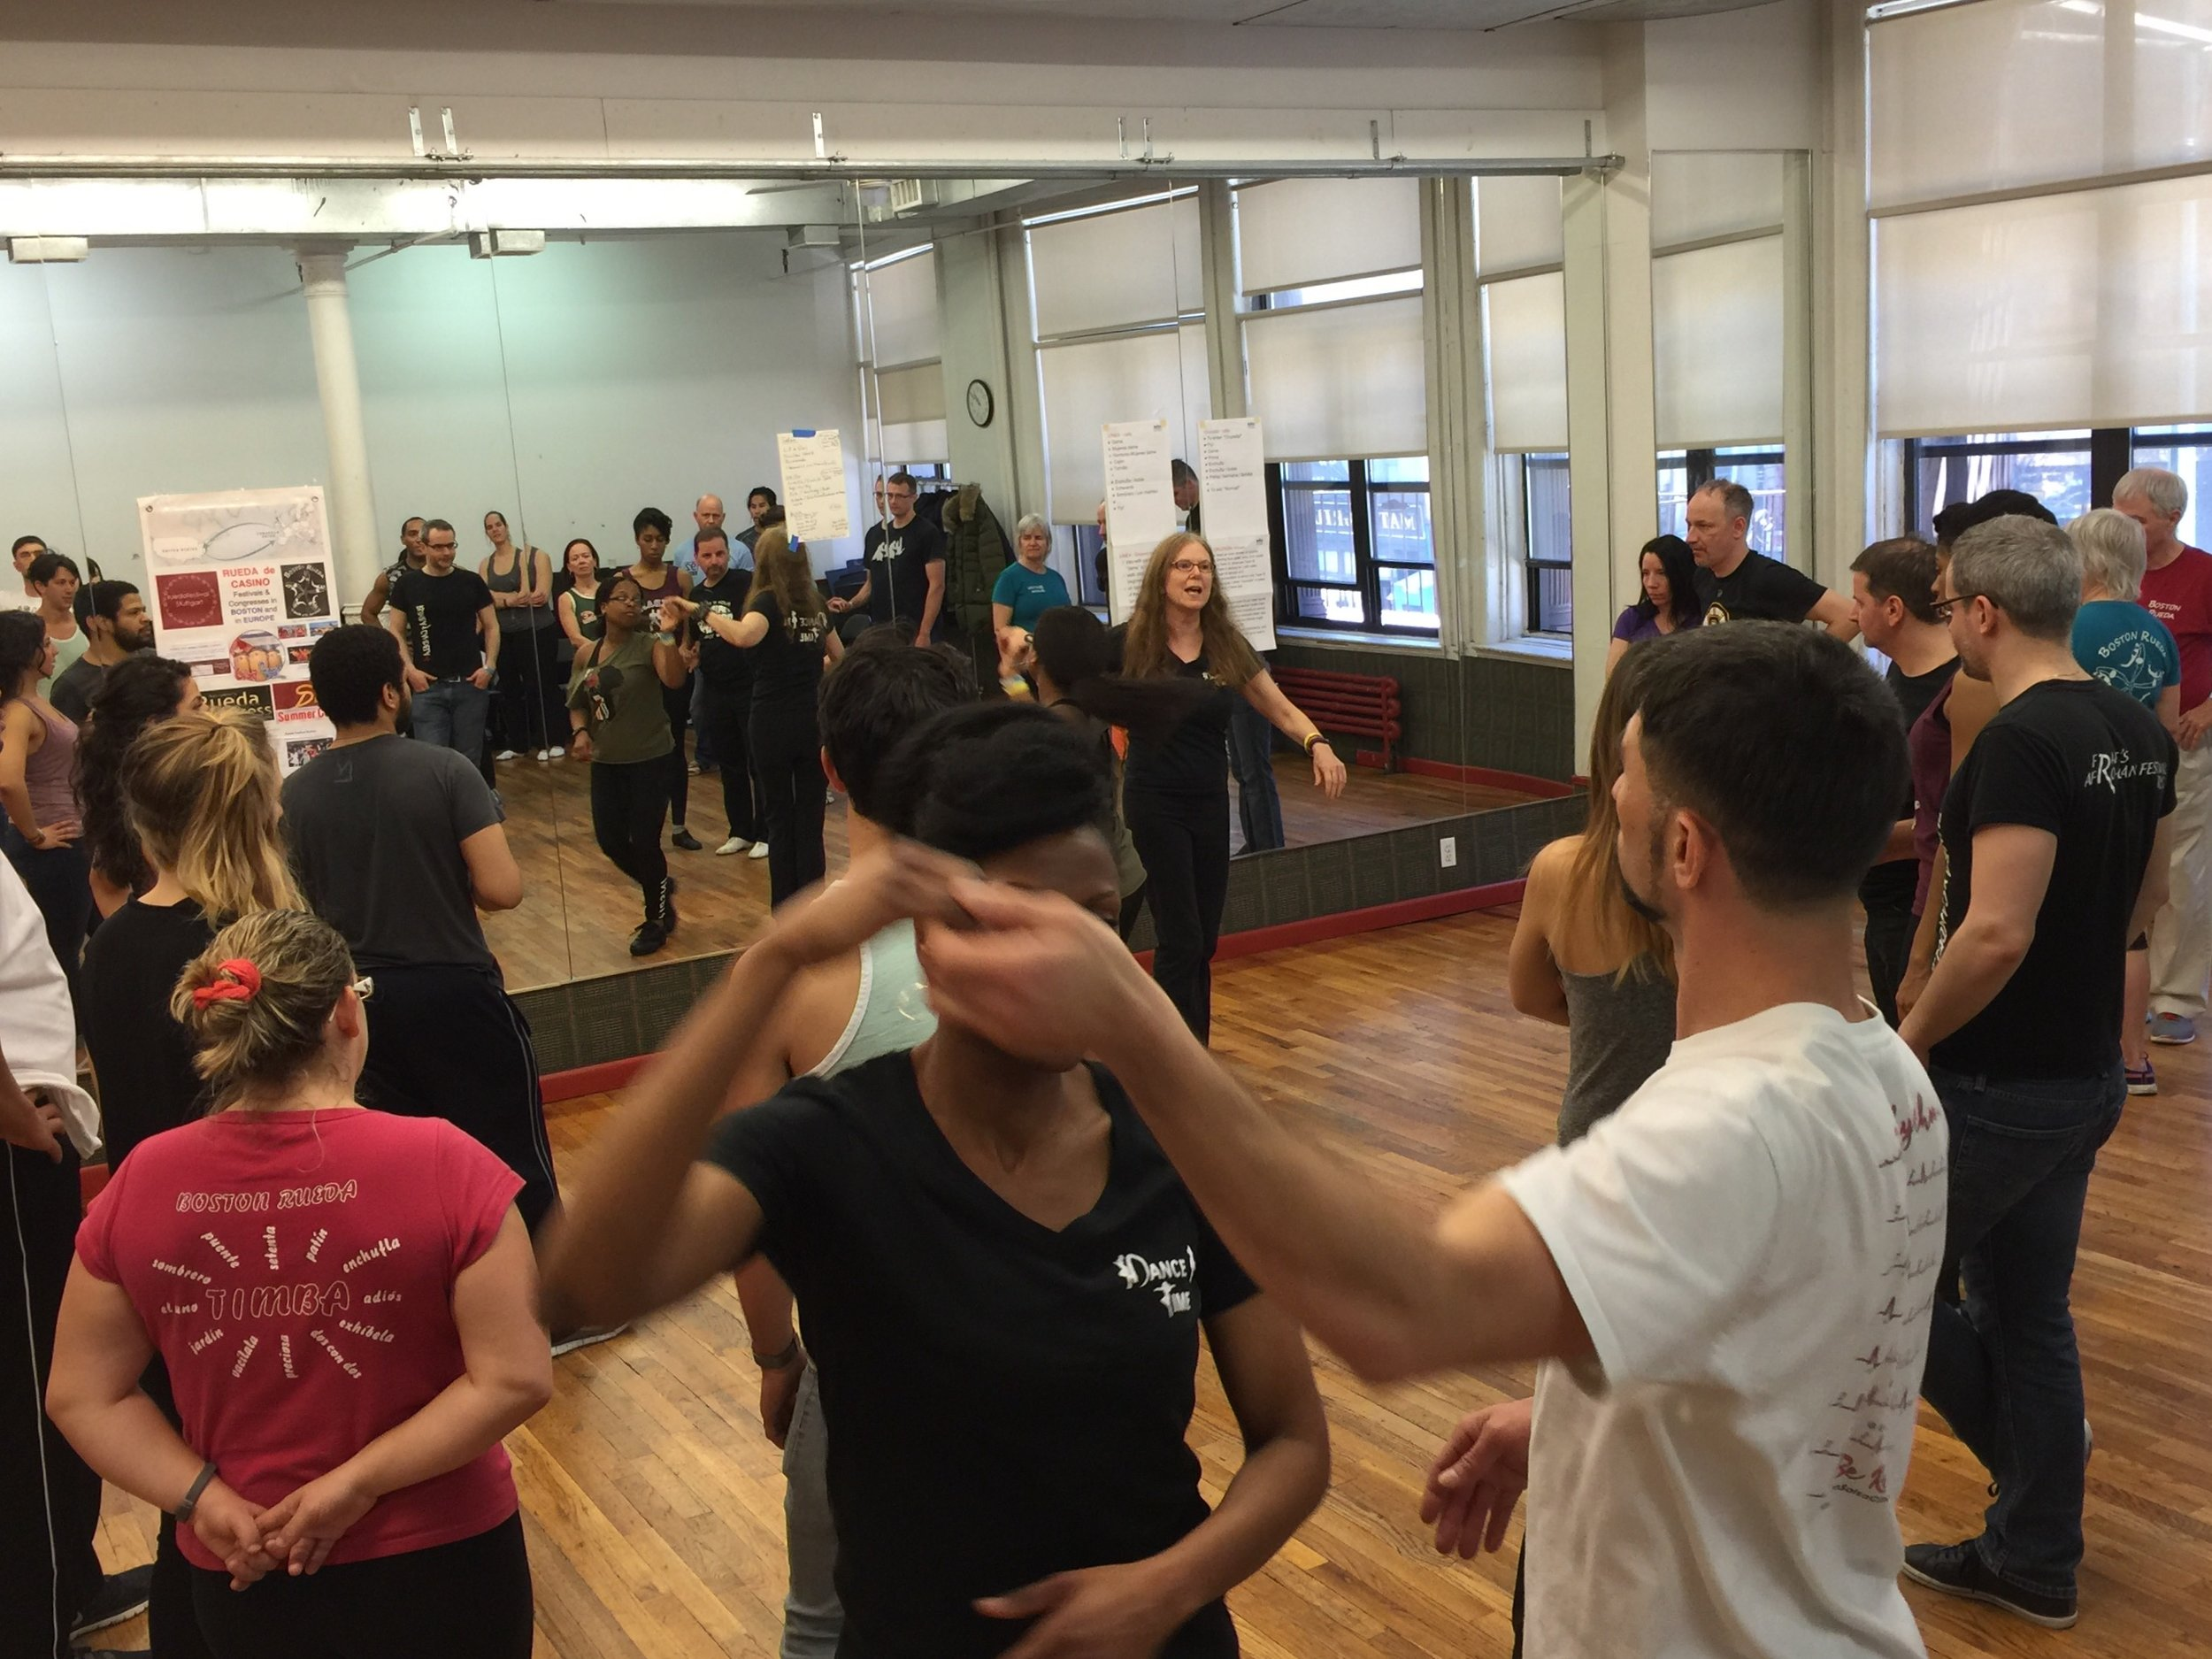 Barb Teaches NY Workshop